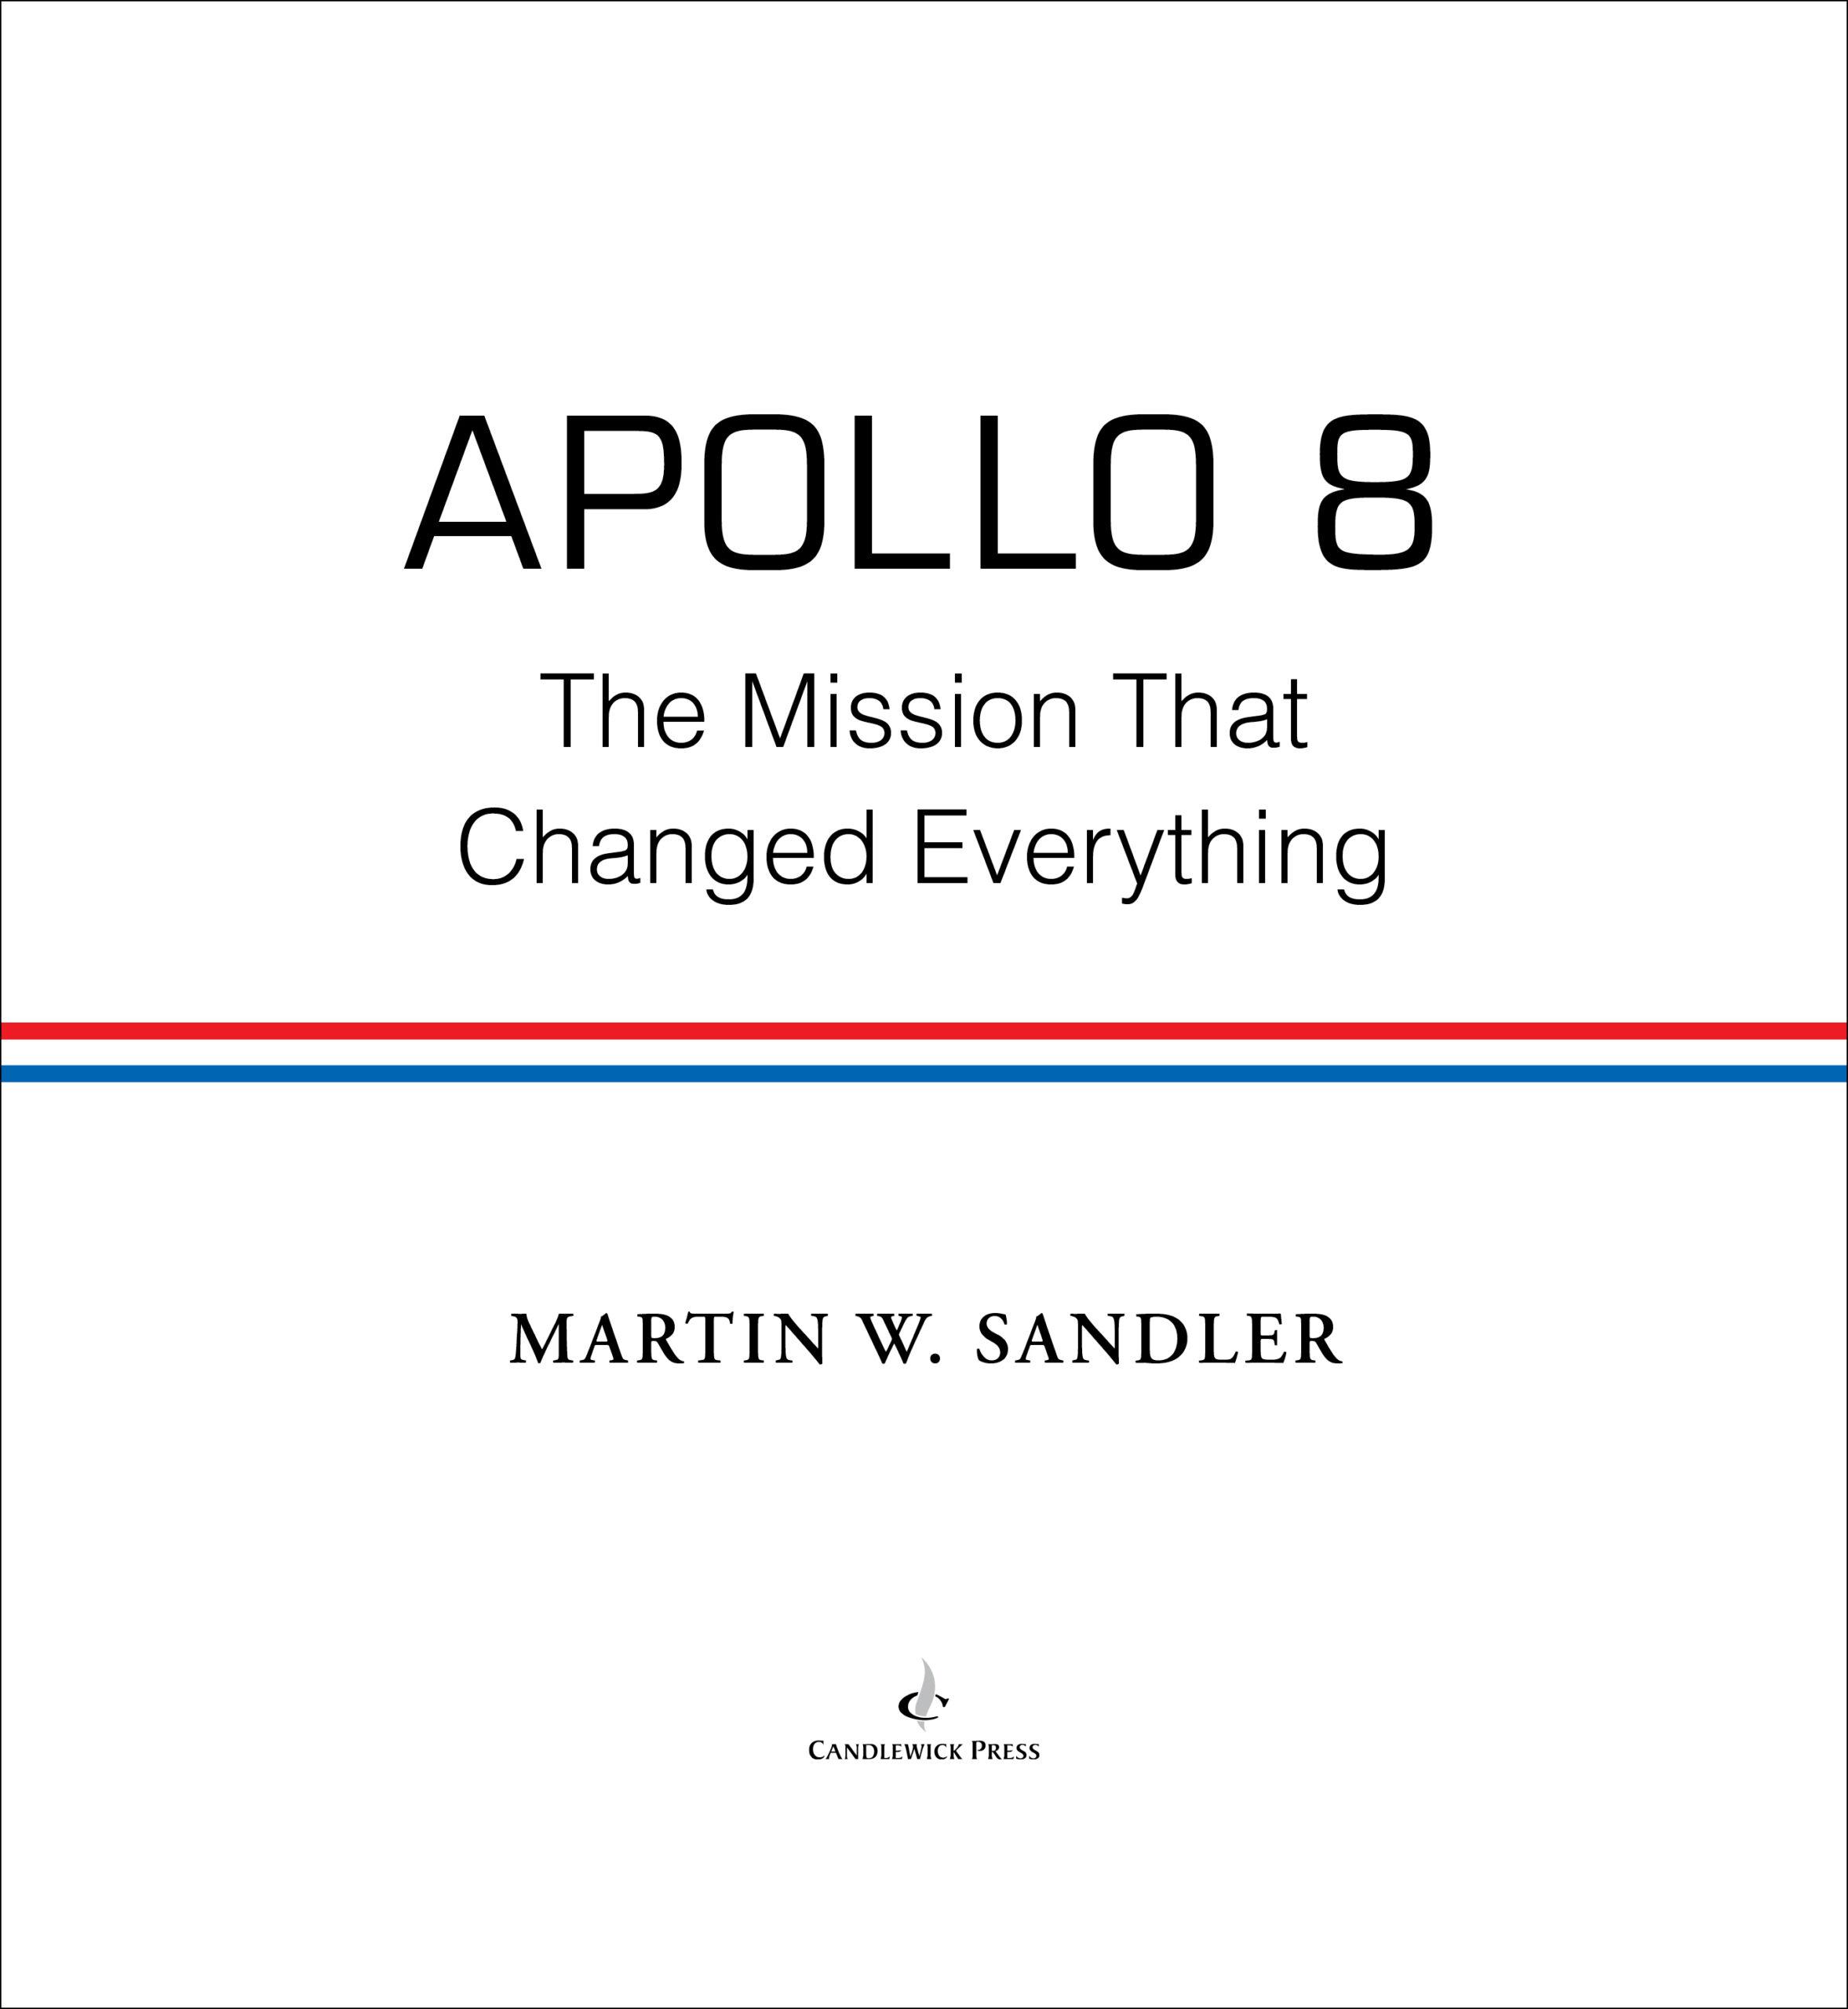 Title page for APOLLO 8